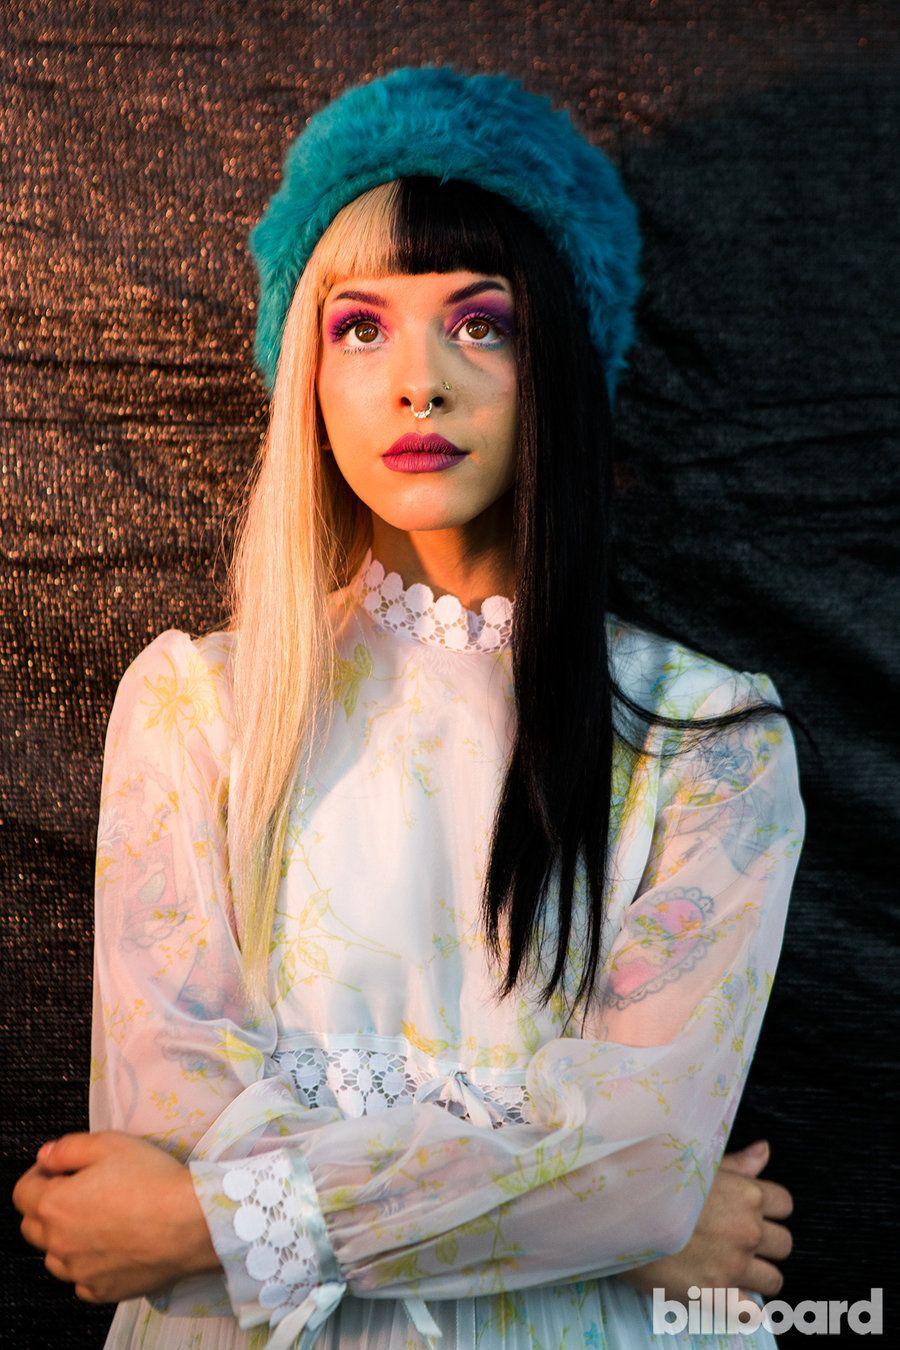 melanie martinez - photo #20